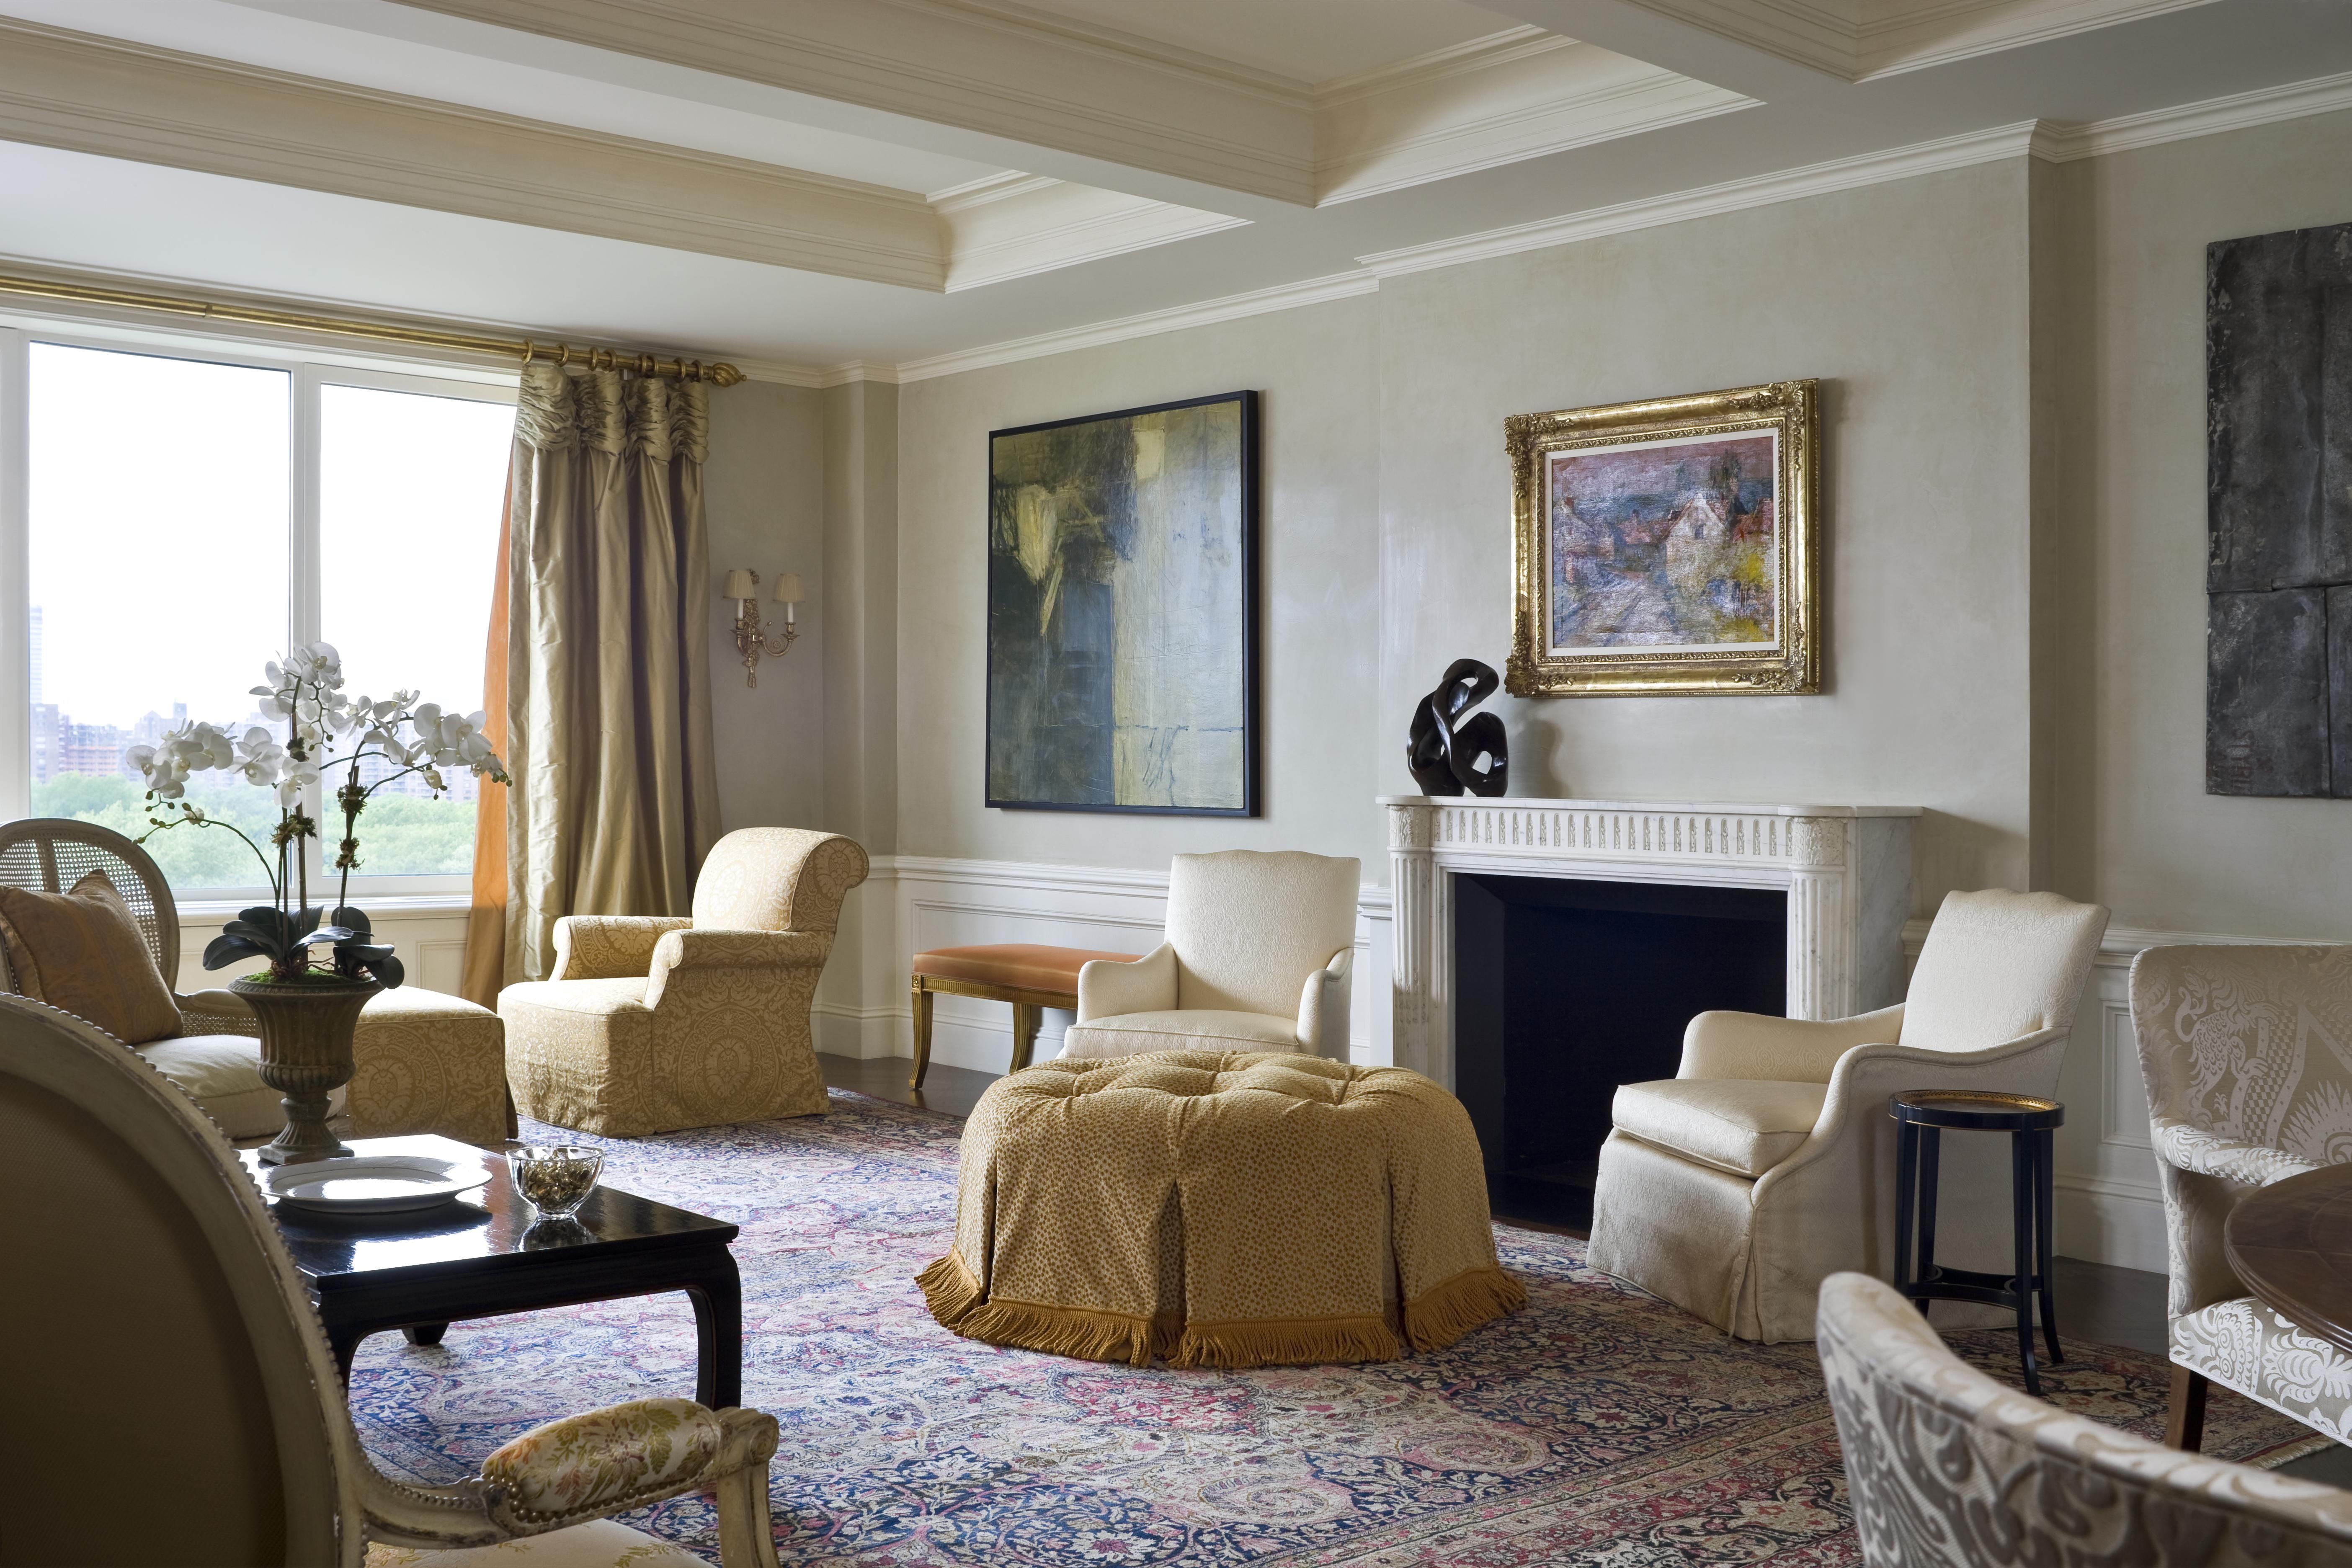 Fifth Avenue Jewel By Garrow Kedigian Interior Design